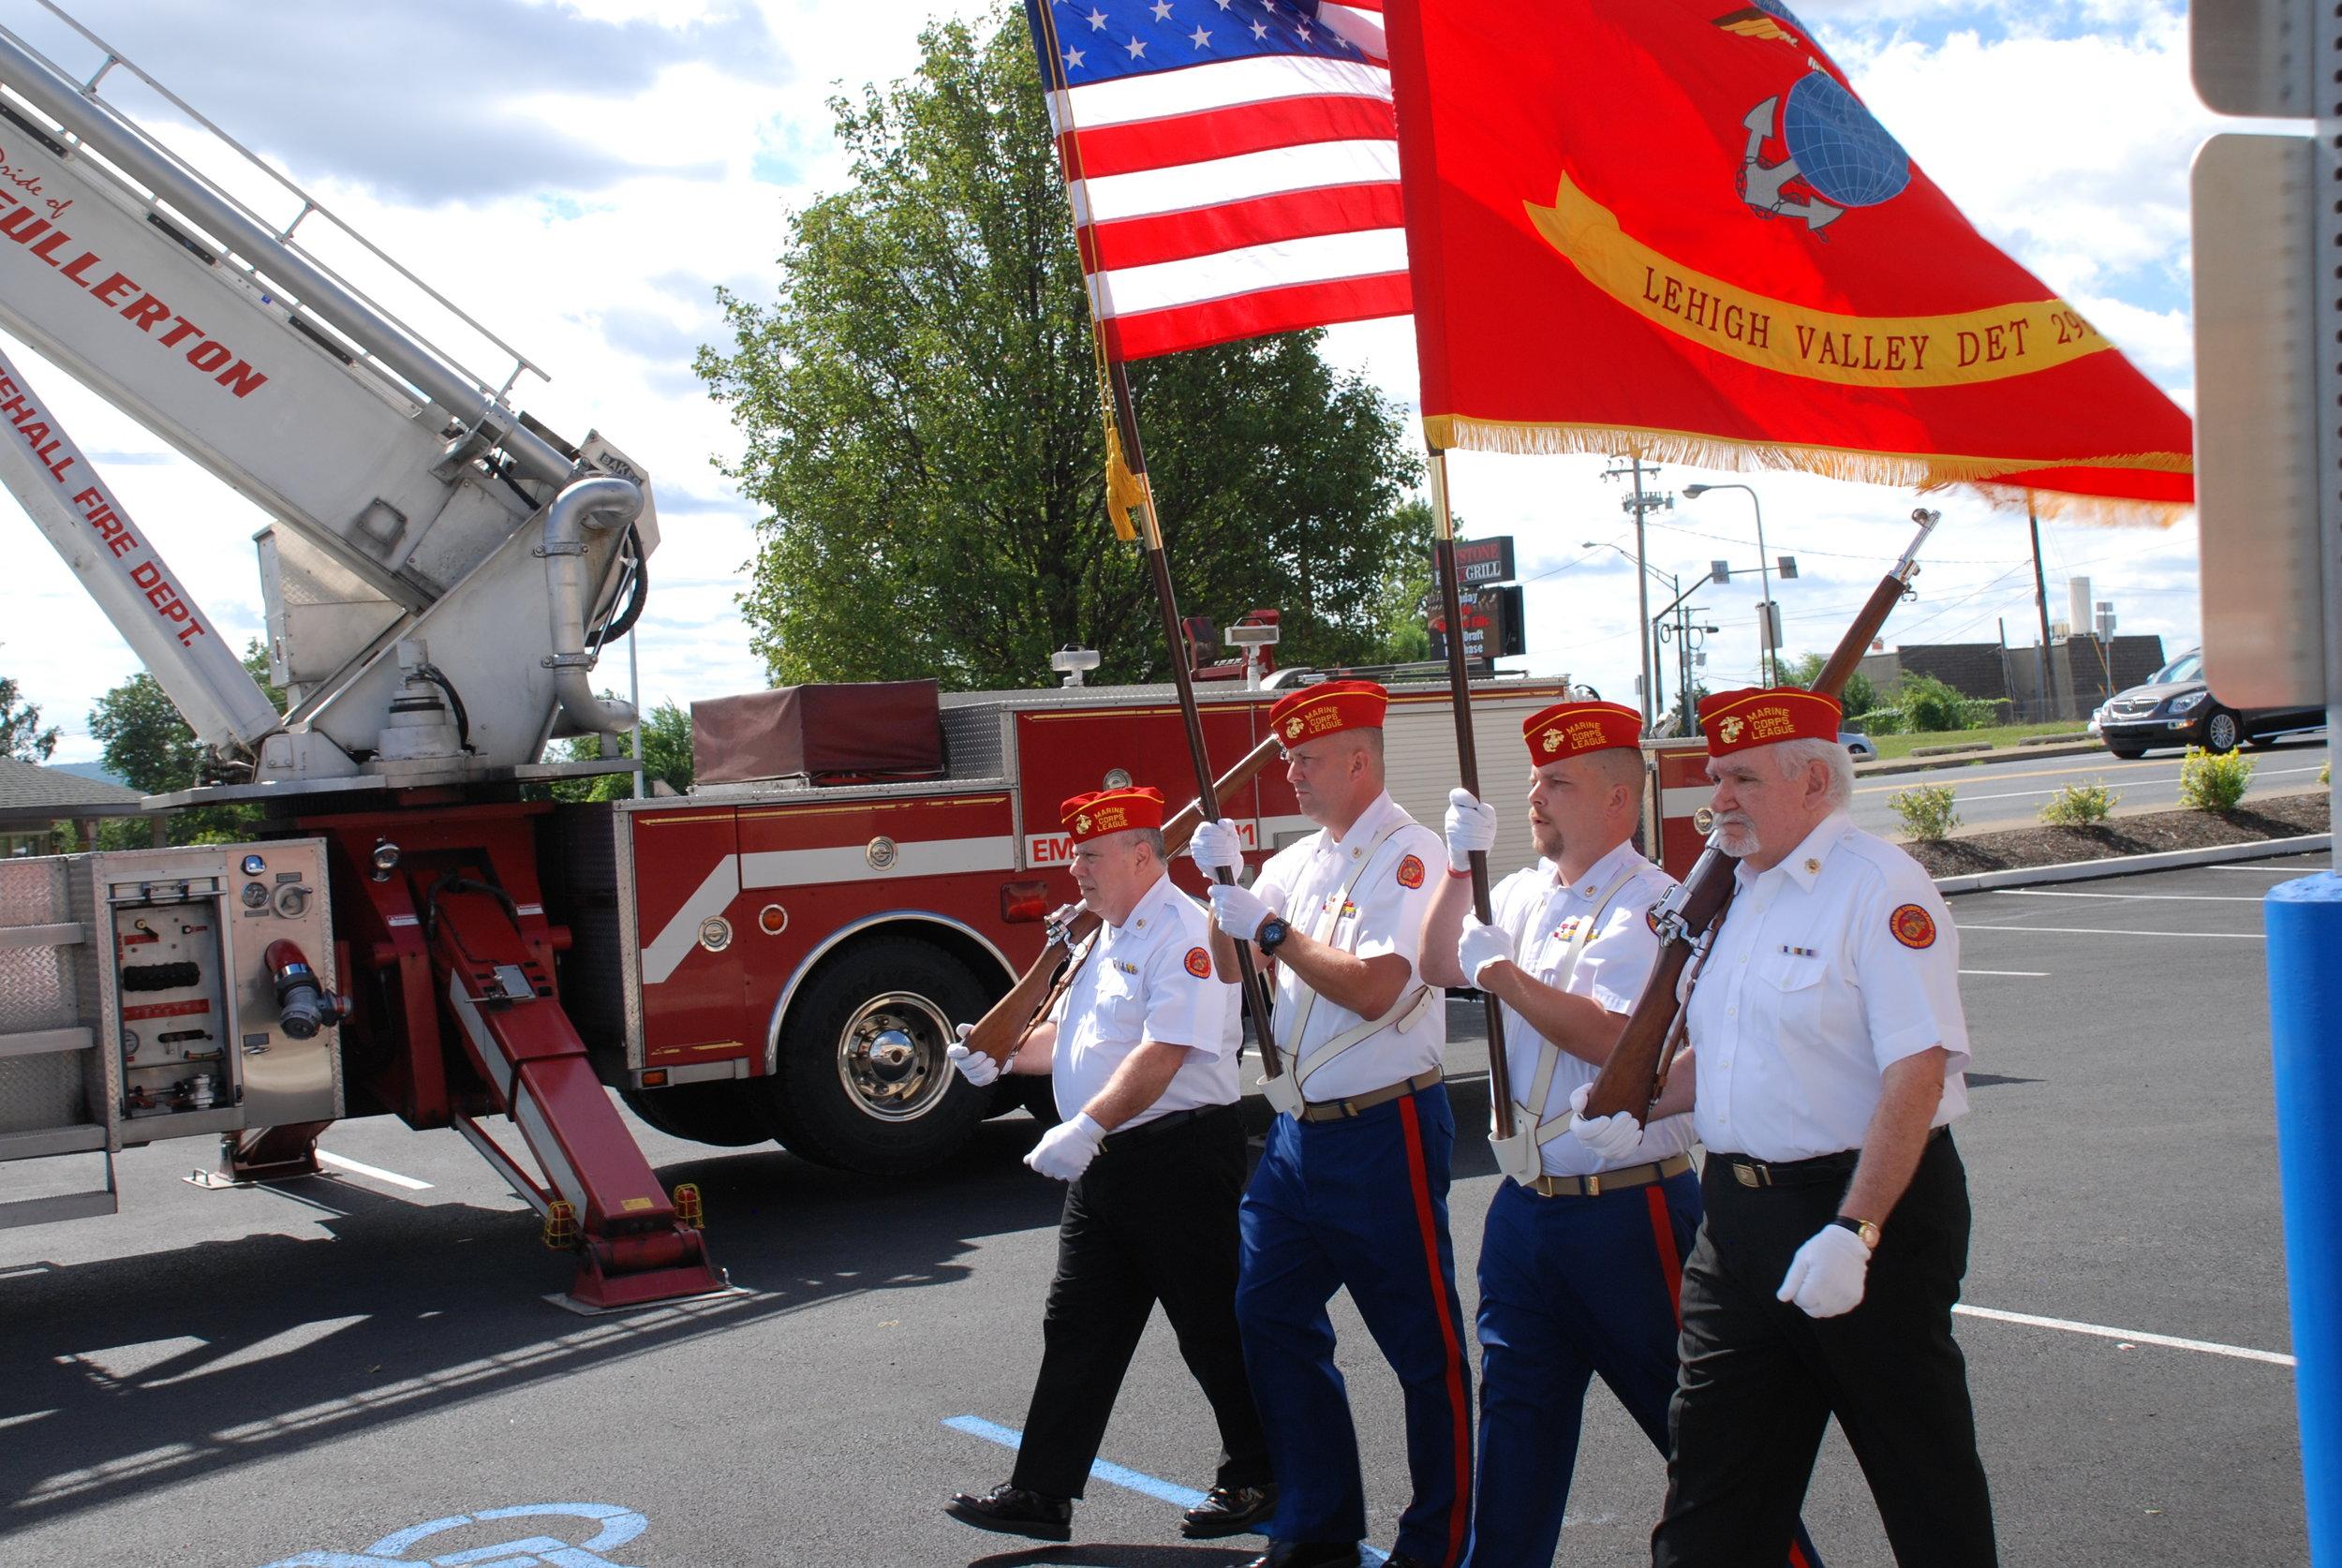 Mission BBQ 9-11 Rememberance Ceremony